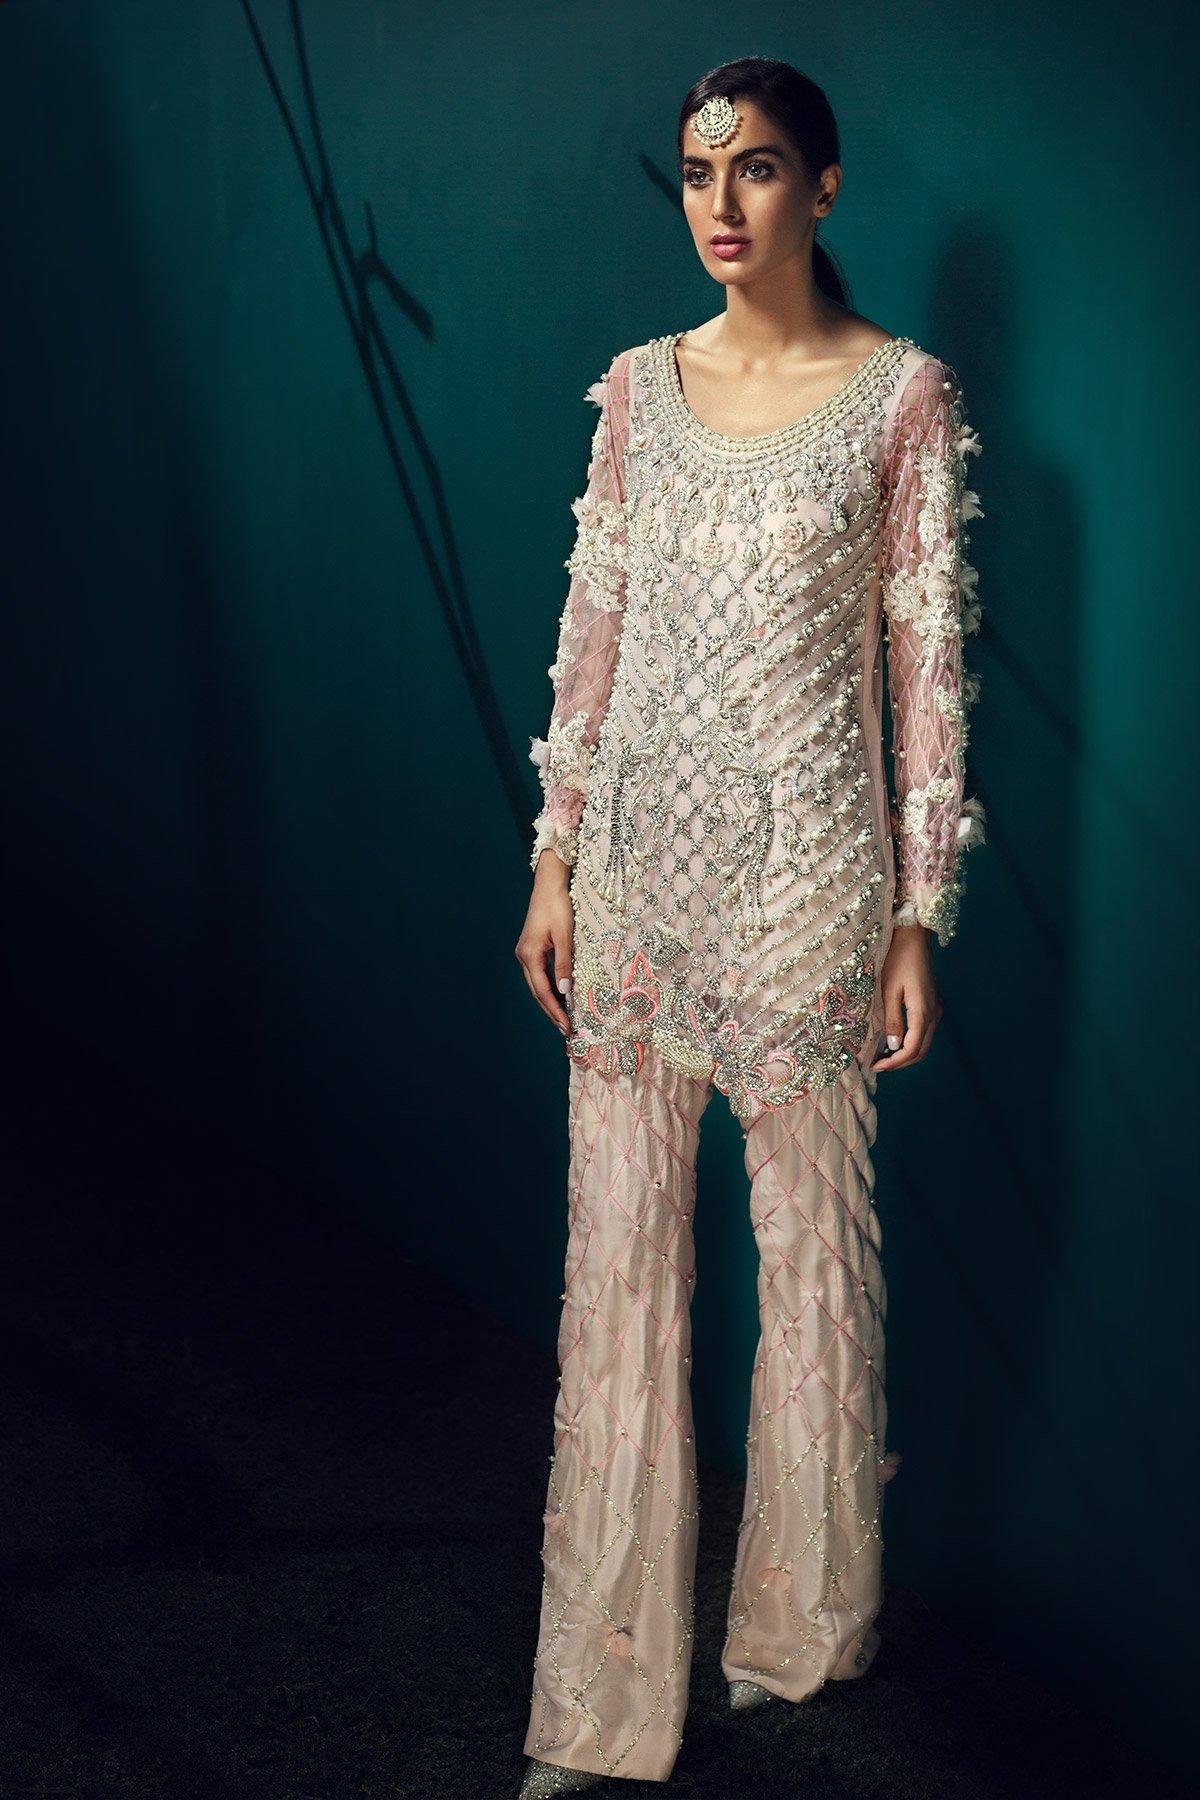 /2019/05/ammara-khan-the-pink-orchid-akpp-6-image1.jpeg